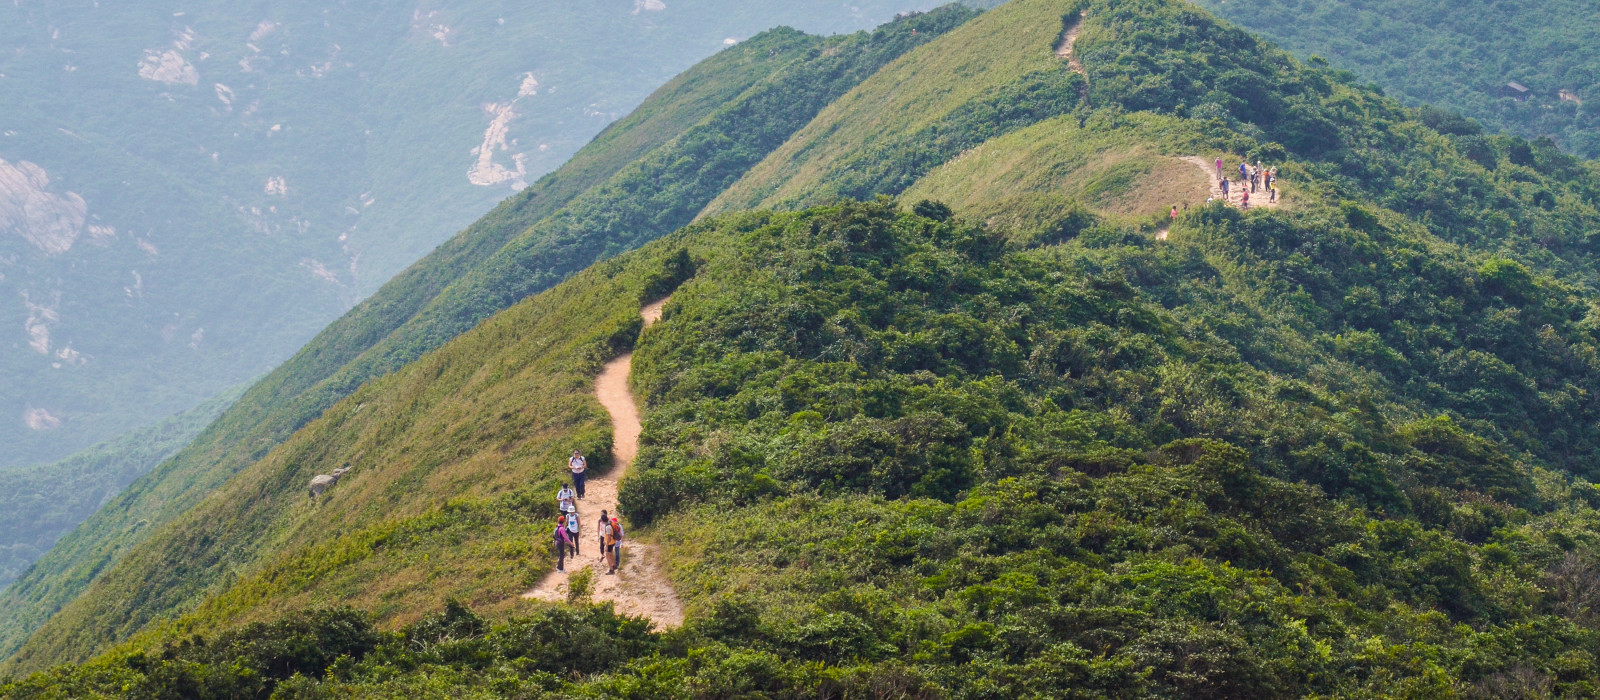 Hong Kong hiking trail scenery - Dragon's Back, Asia